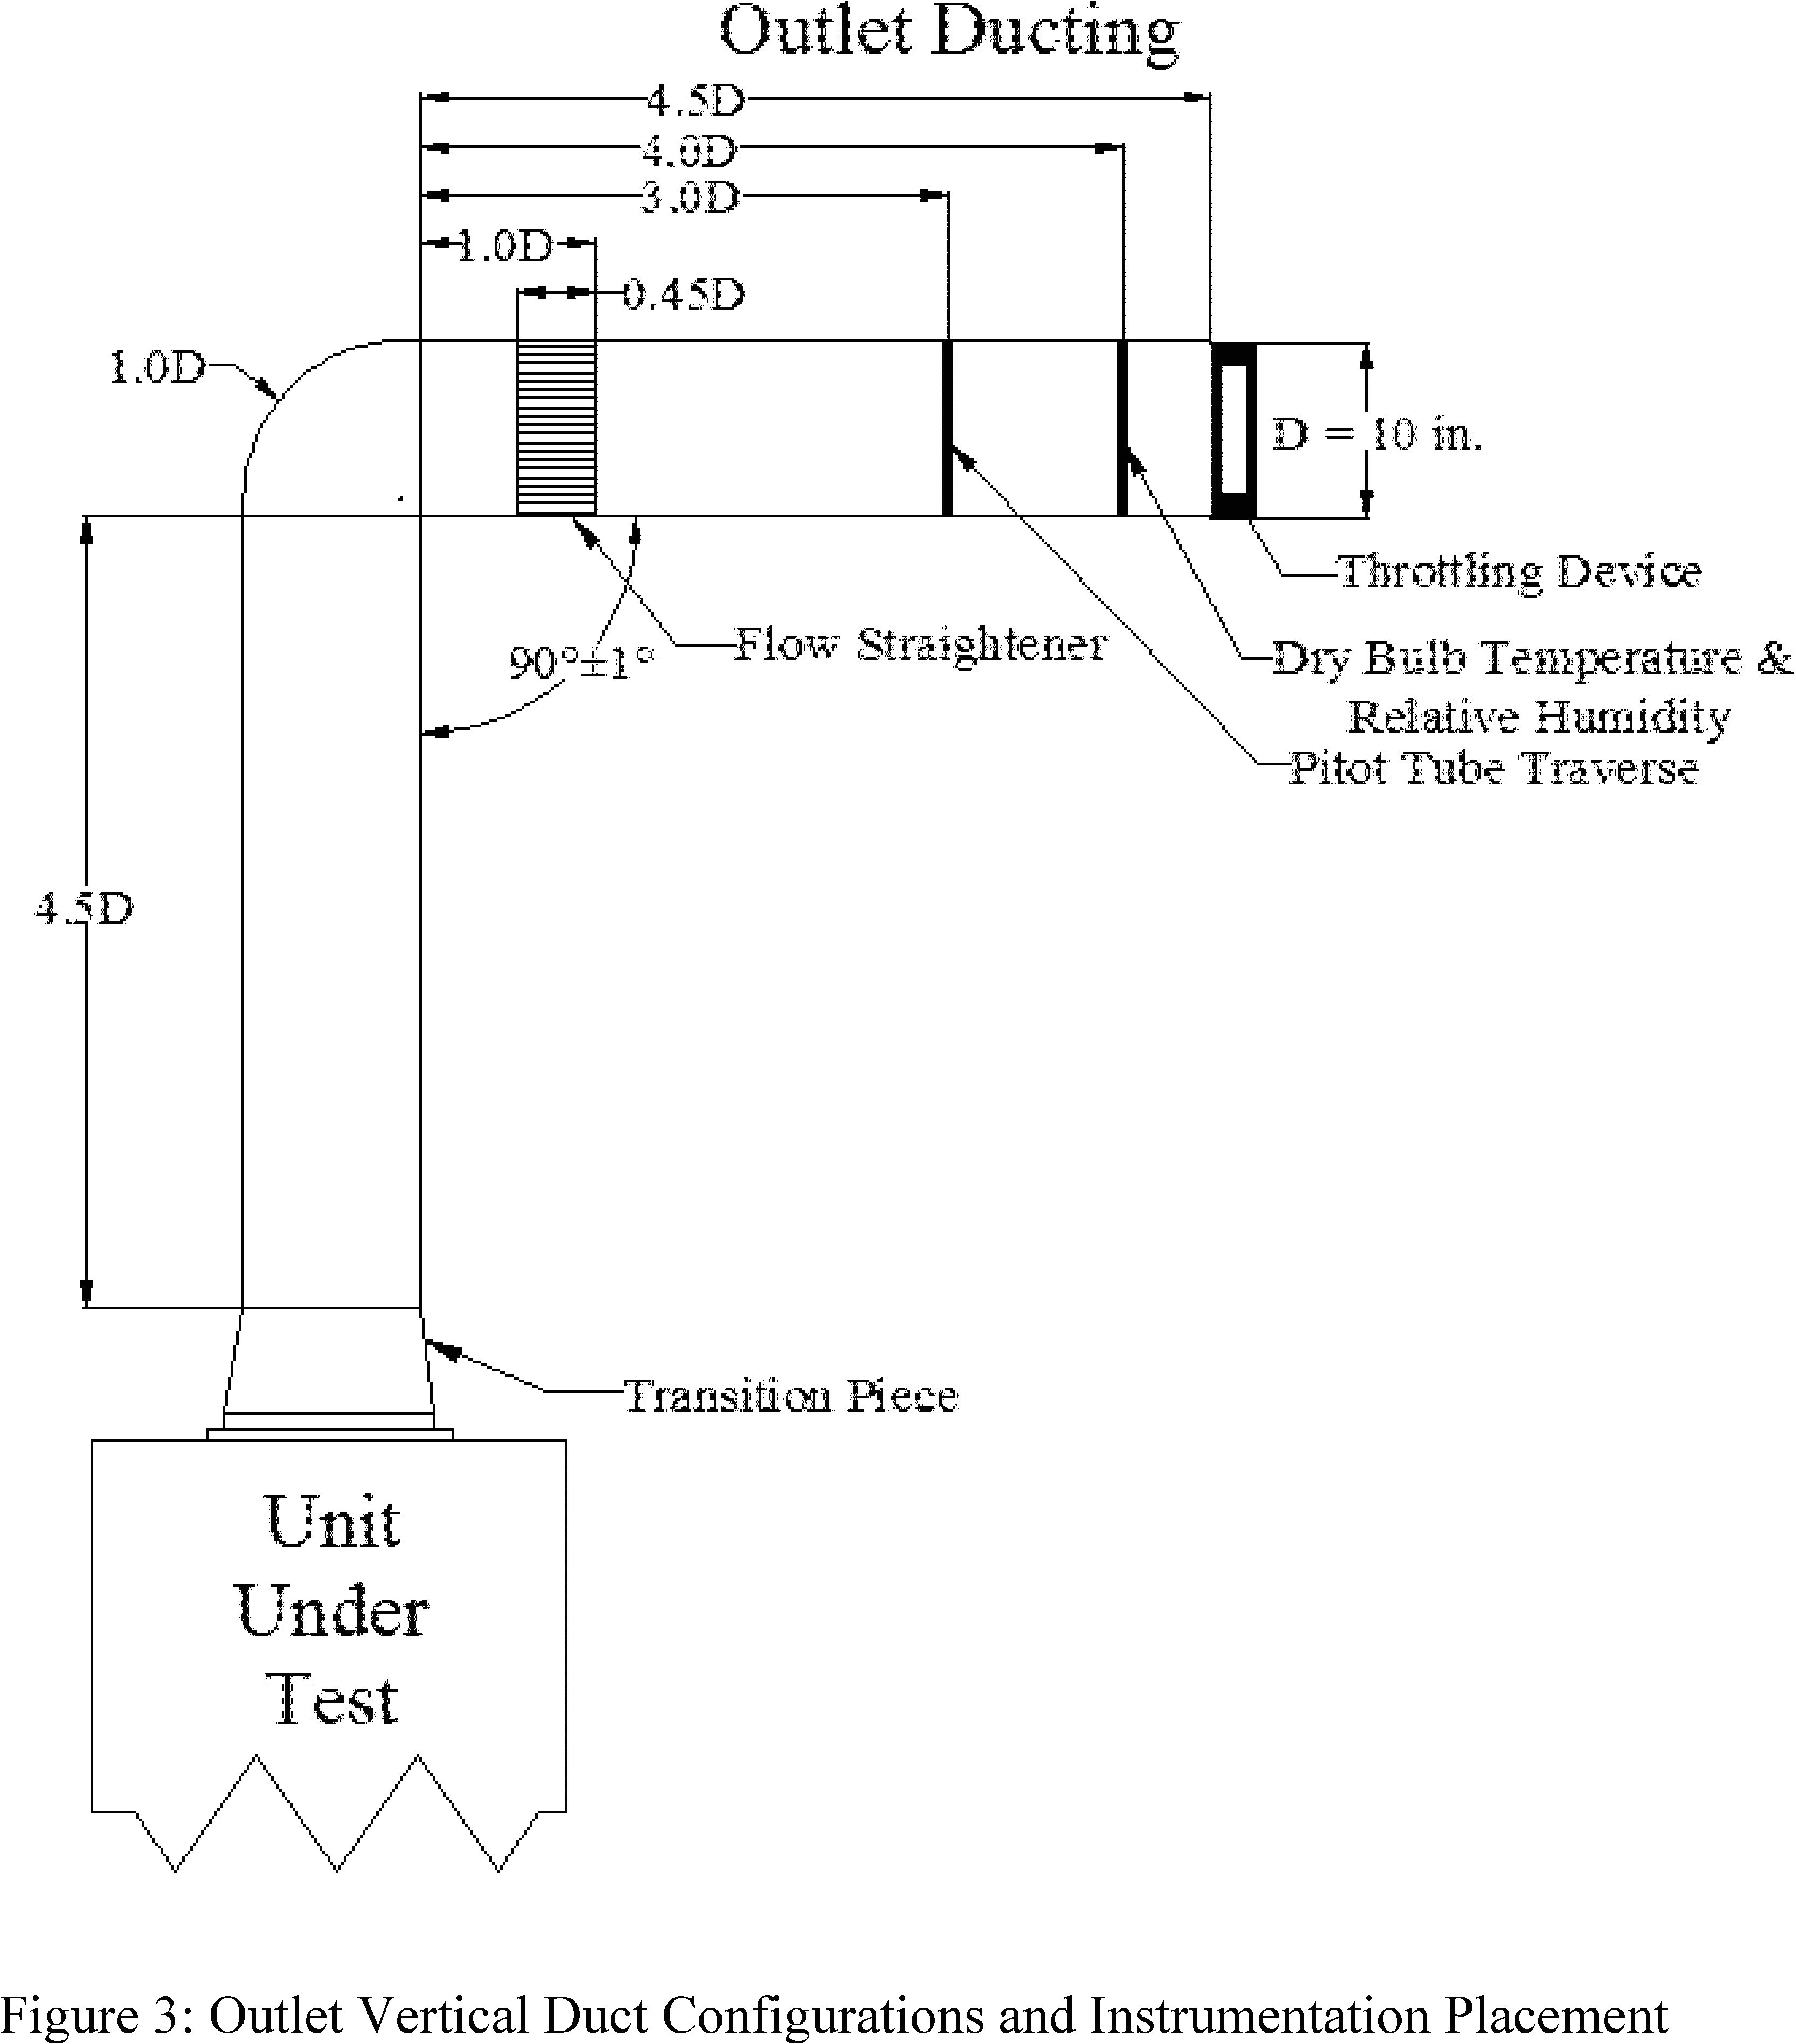 freezer thermostat wiring diagram adanaliyiz org wiring diagram trane heat pump twe036c14